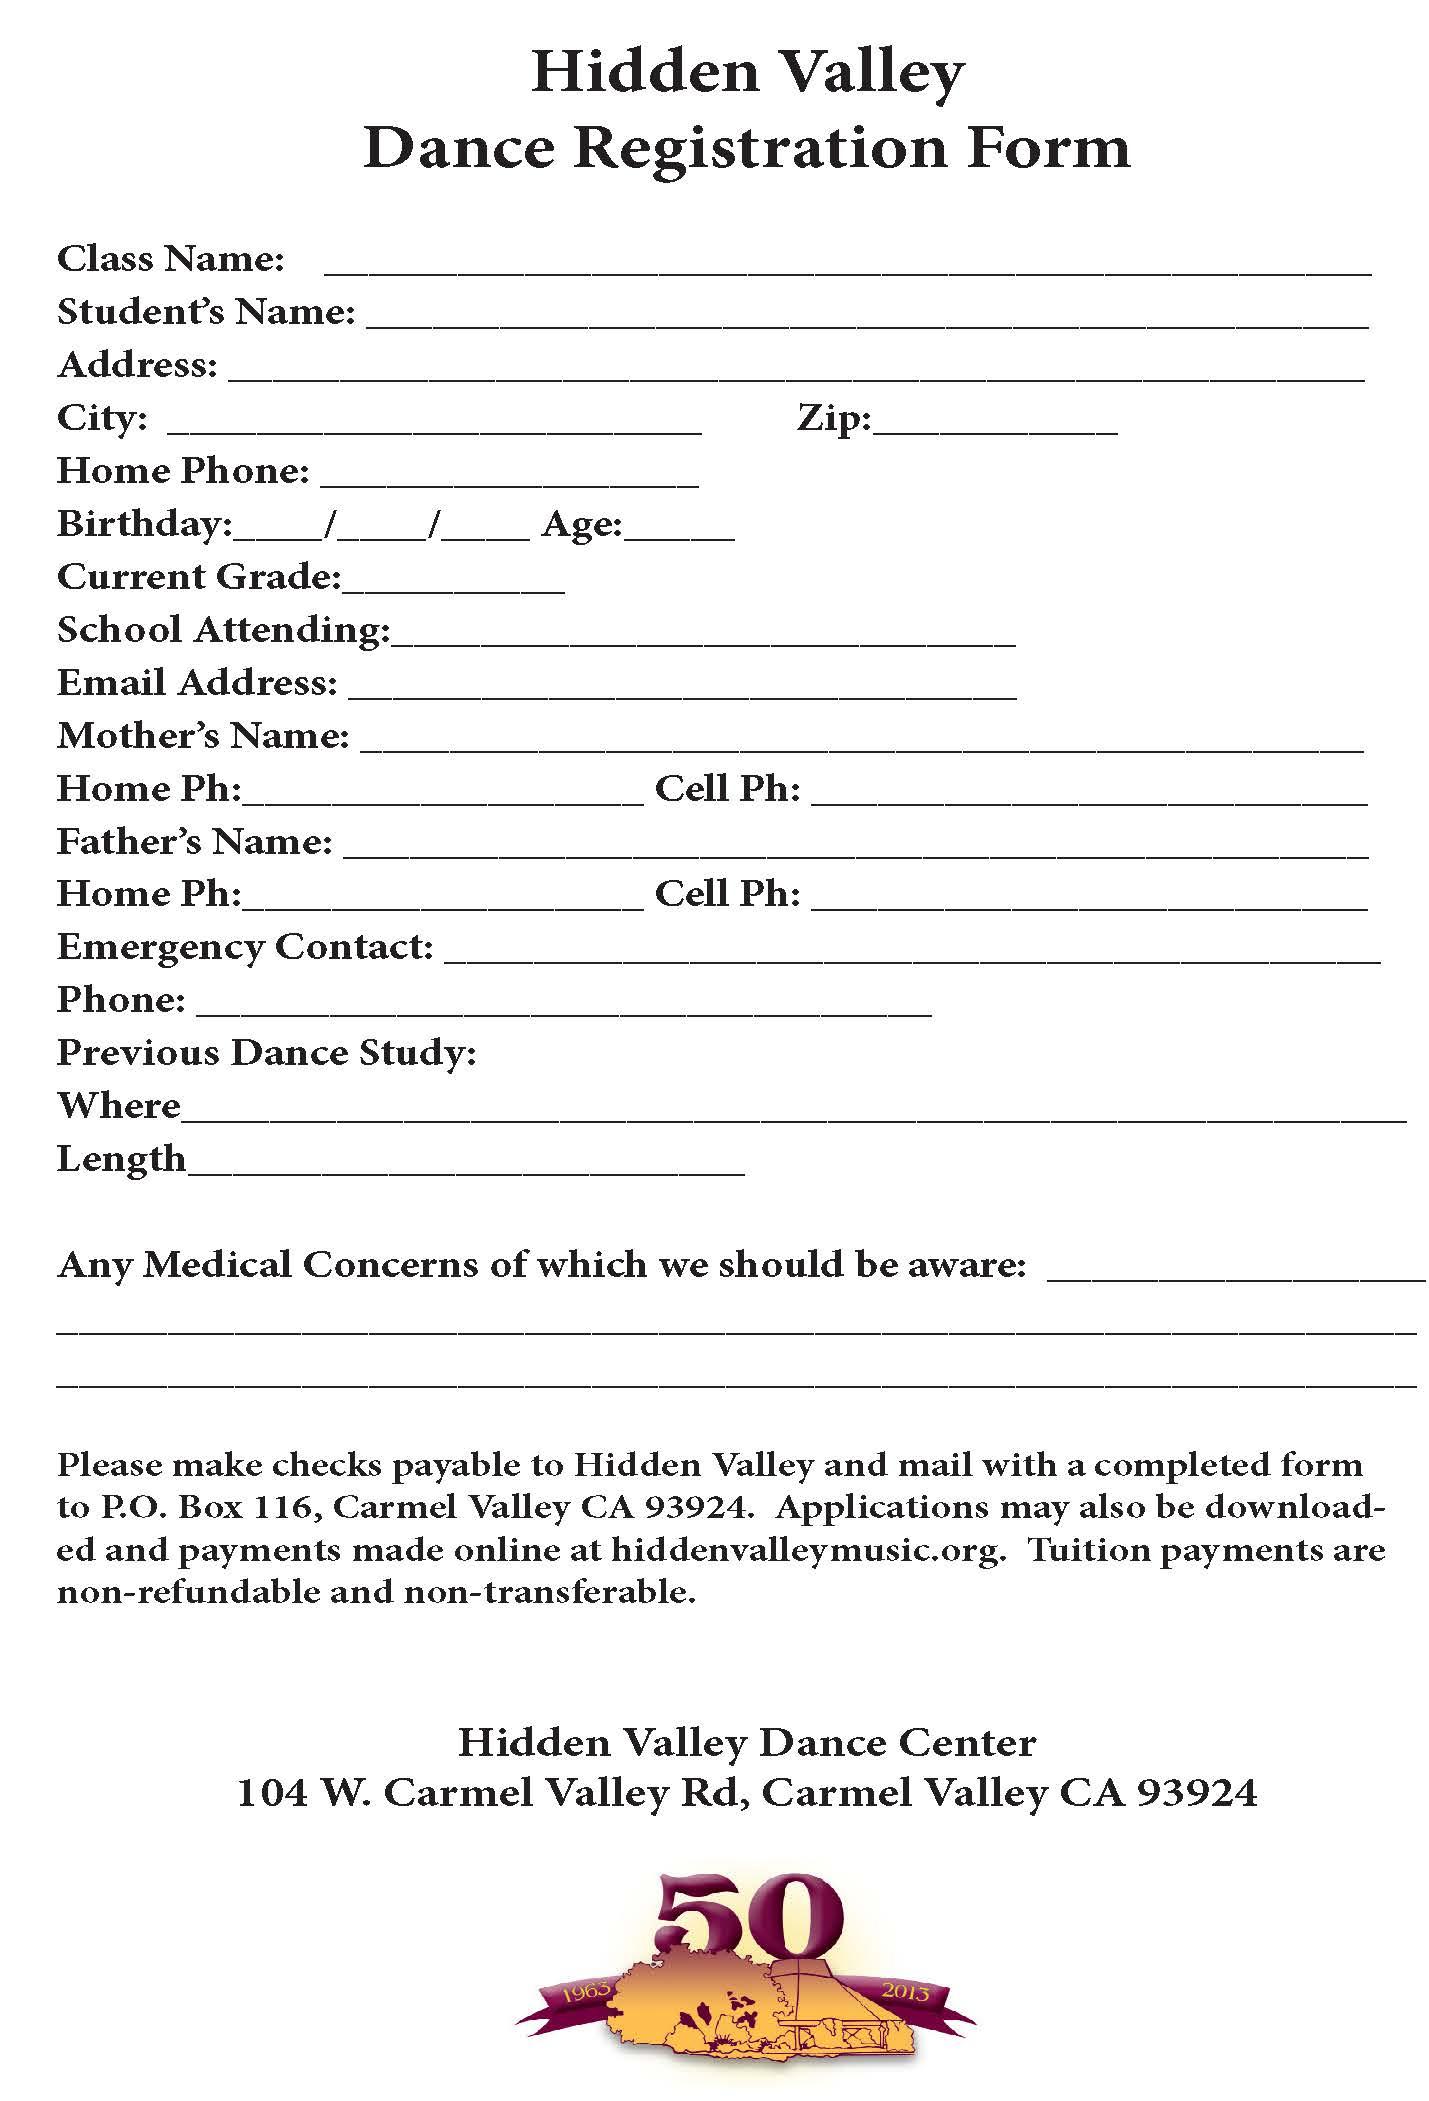 Dance Registration Form (Hidden Valley Music Seminars, an Institute